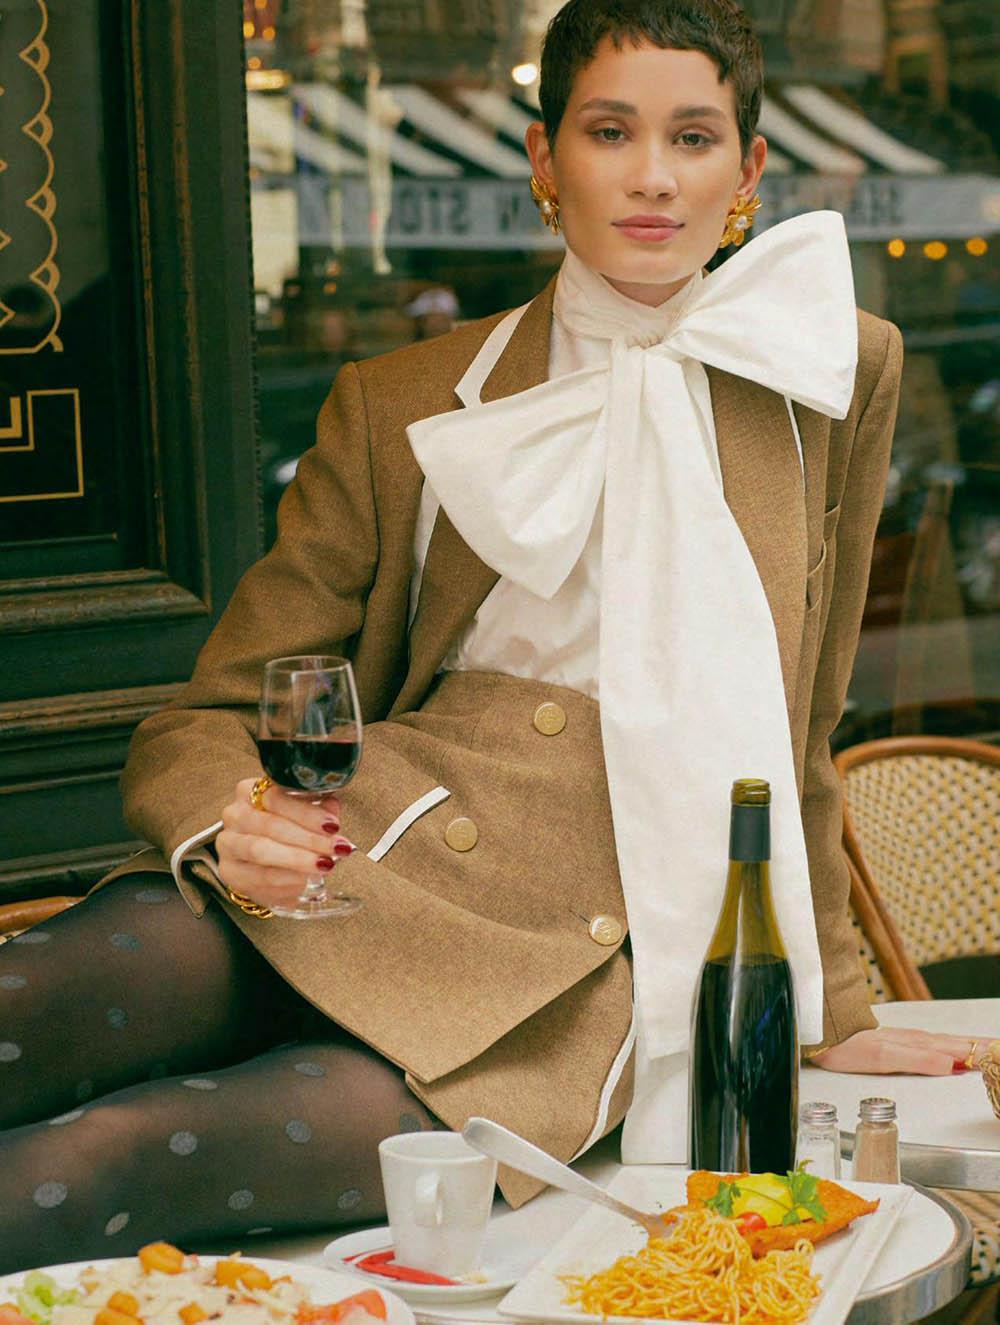 Katia Andre by Daniel Clavero for Elle UK September 2019